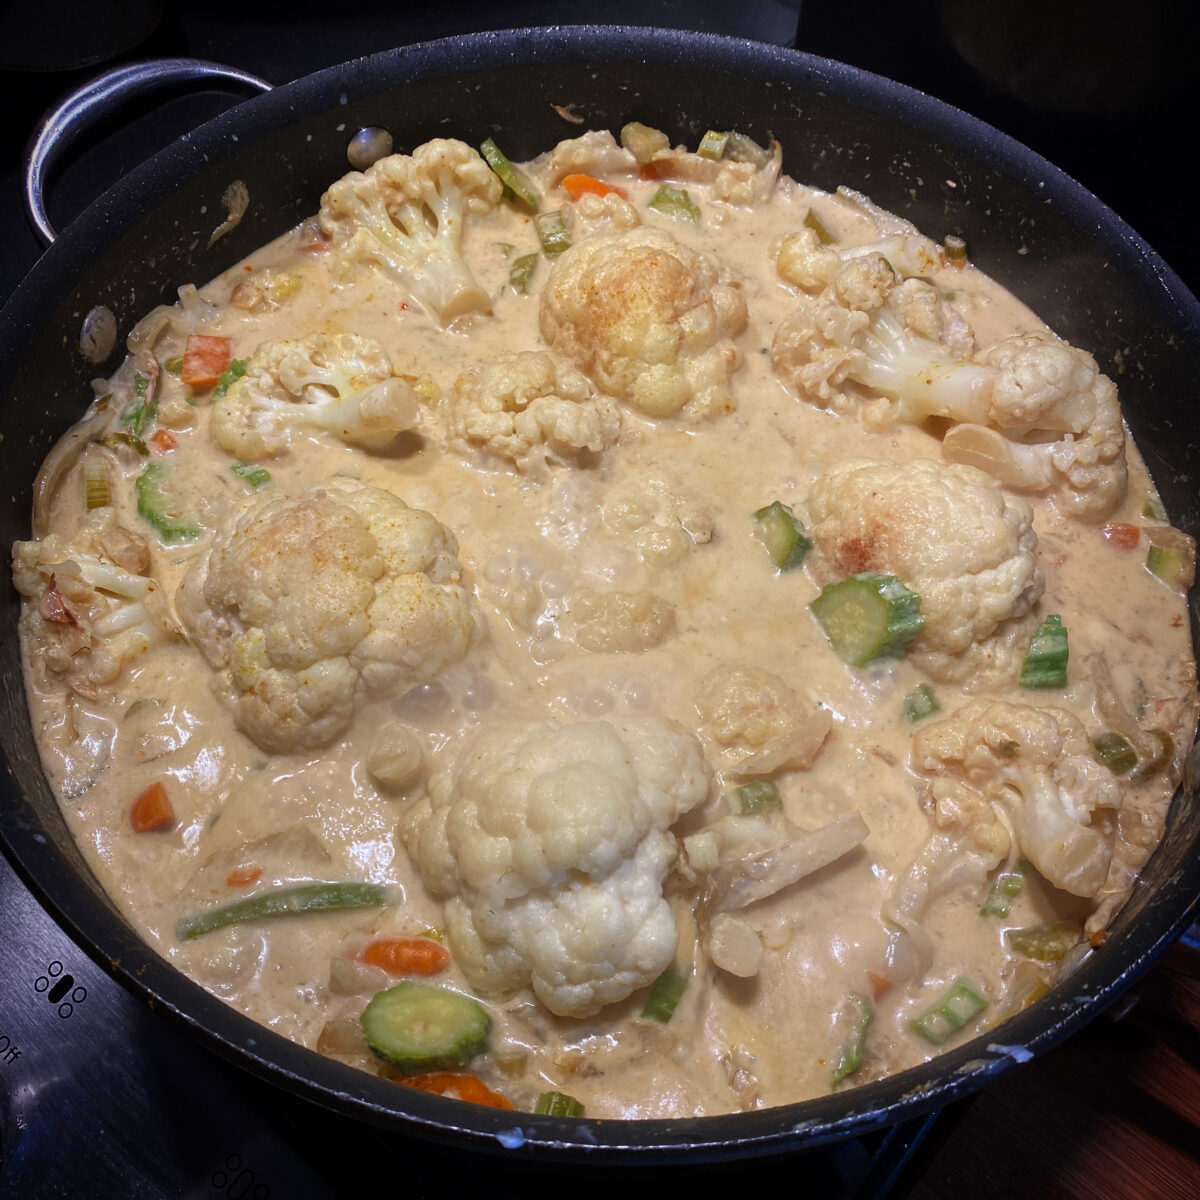 McThai's Cauliflower Coconut Curry